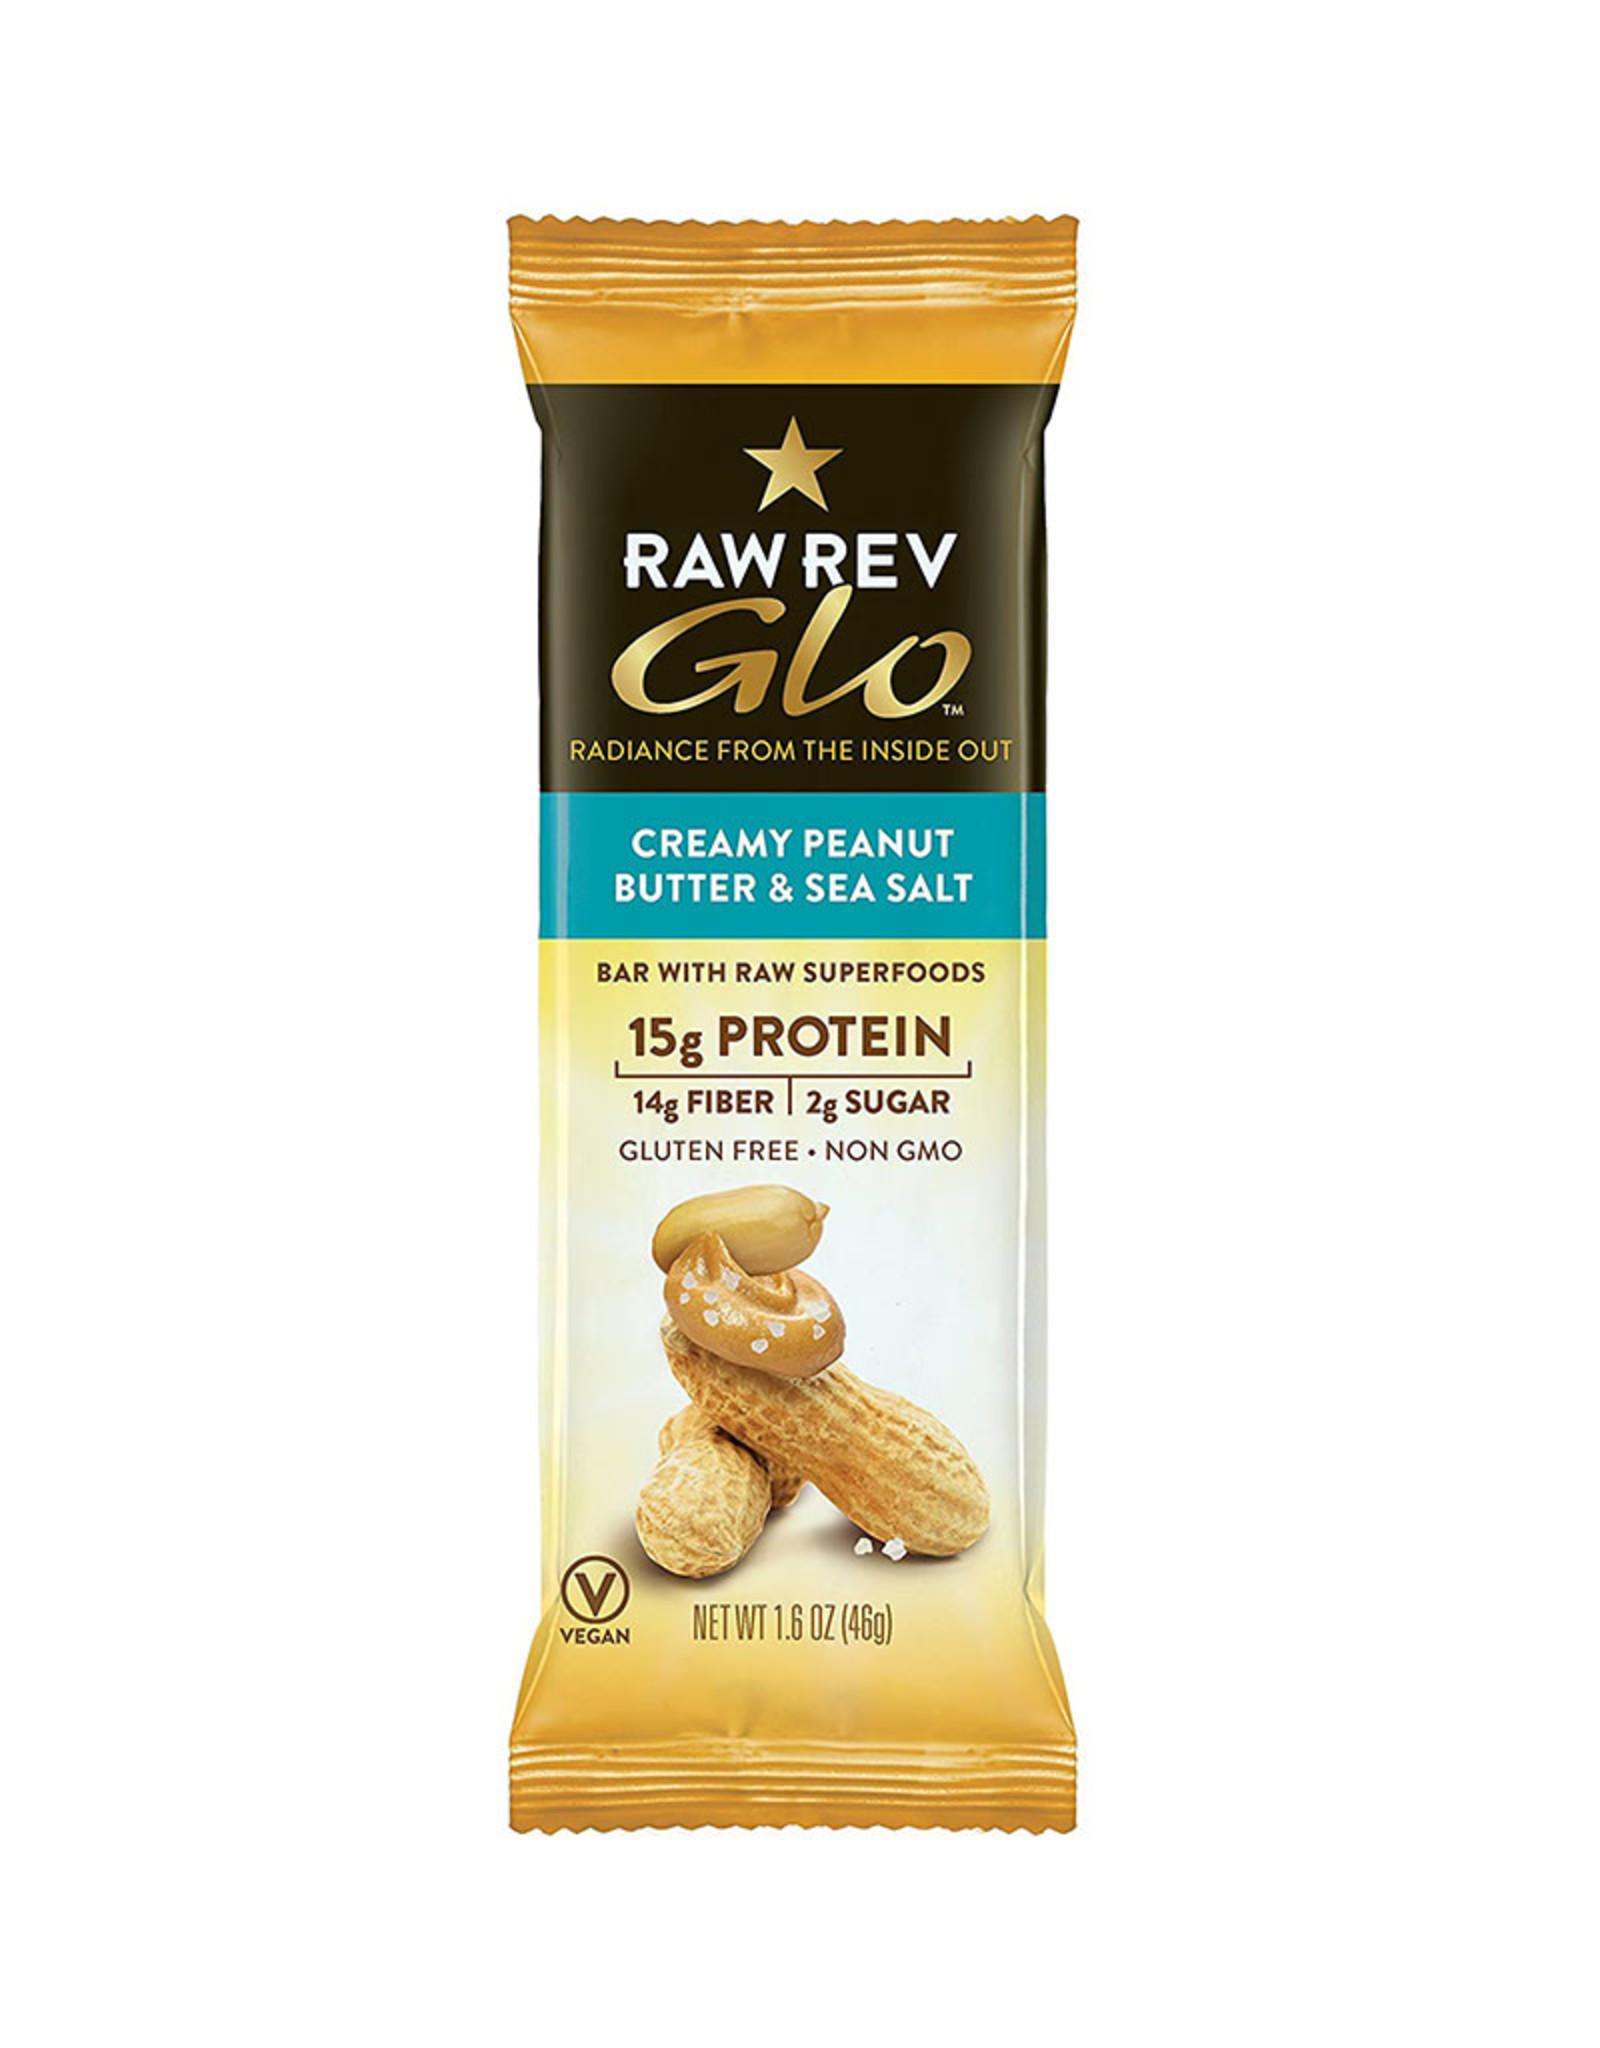 RAW Revolution Raw Revolution - Glo, Creamy Peanut Butter & Sea Salt